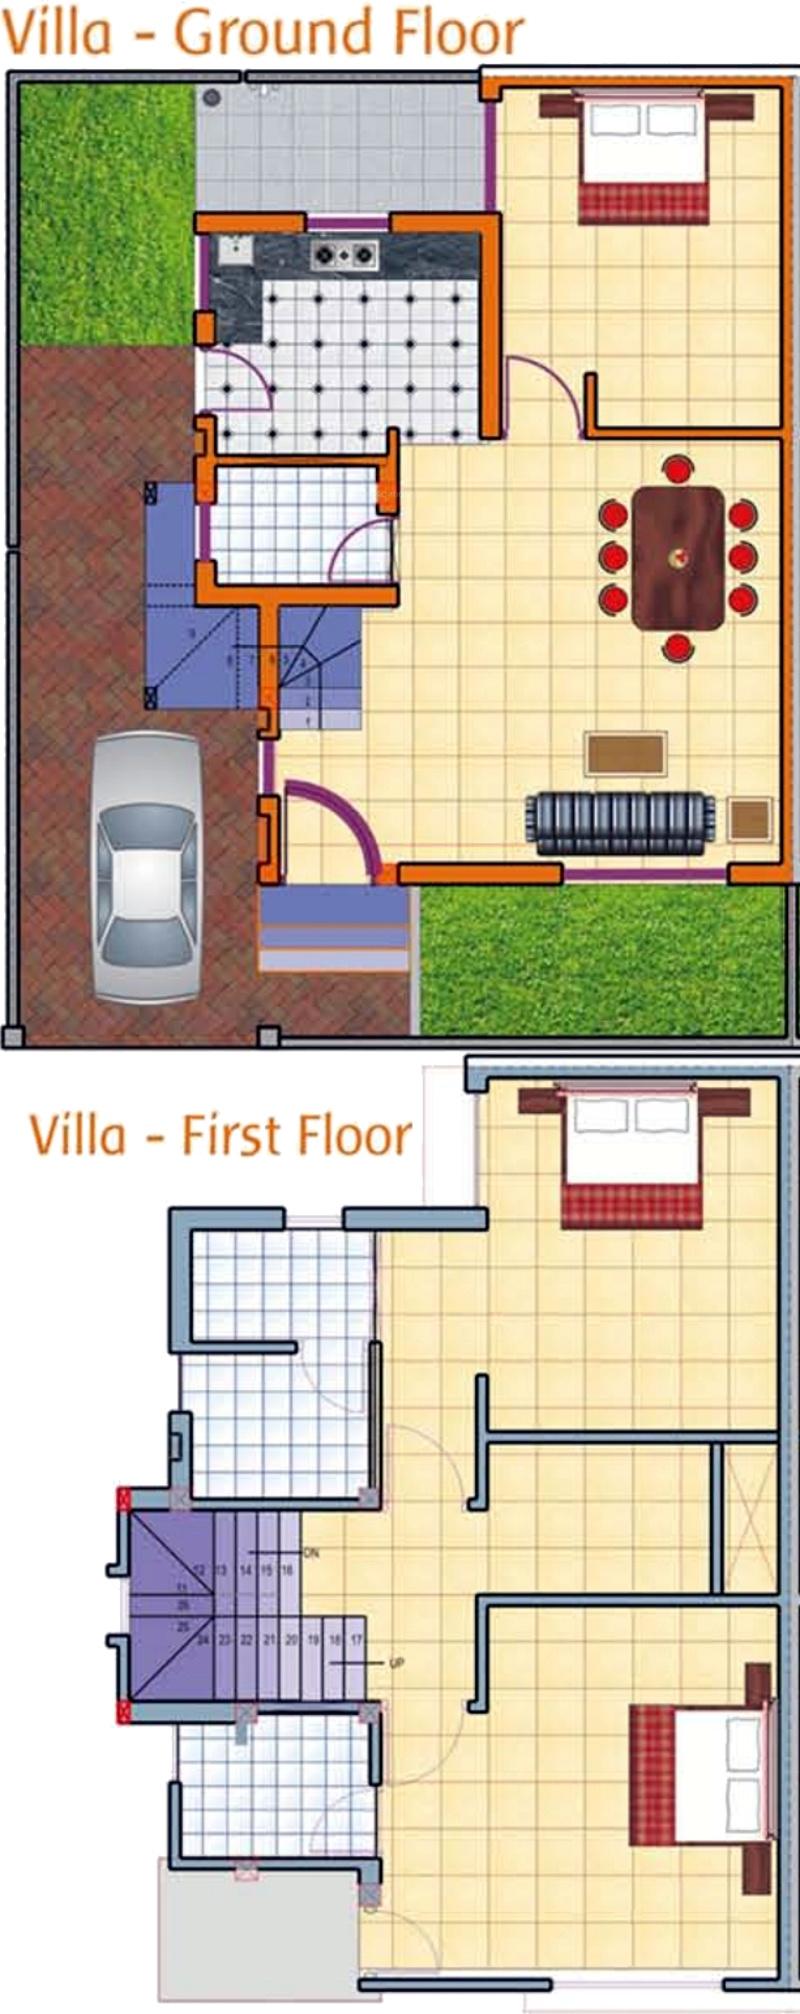 Pratham residency in waghodia vadodara price location for X2 residency floor plan